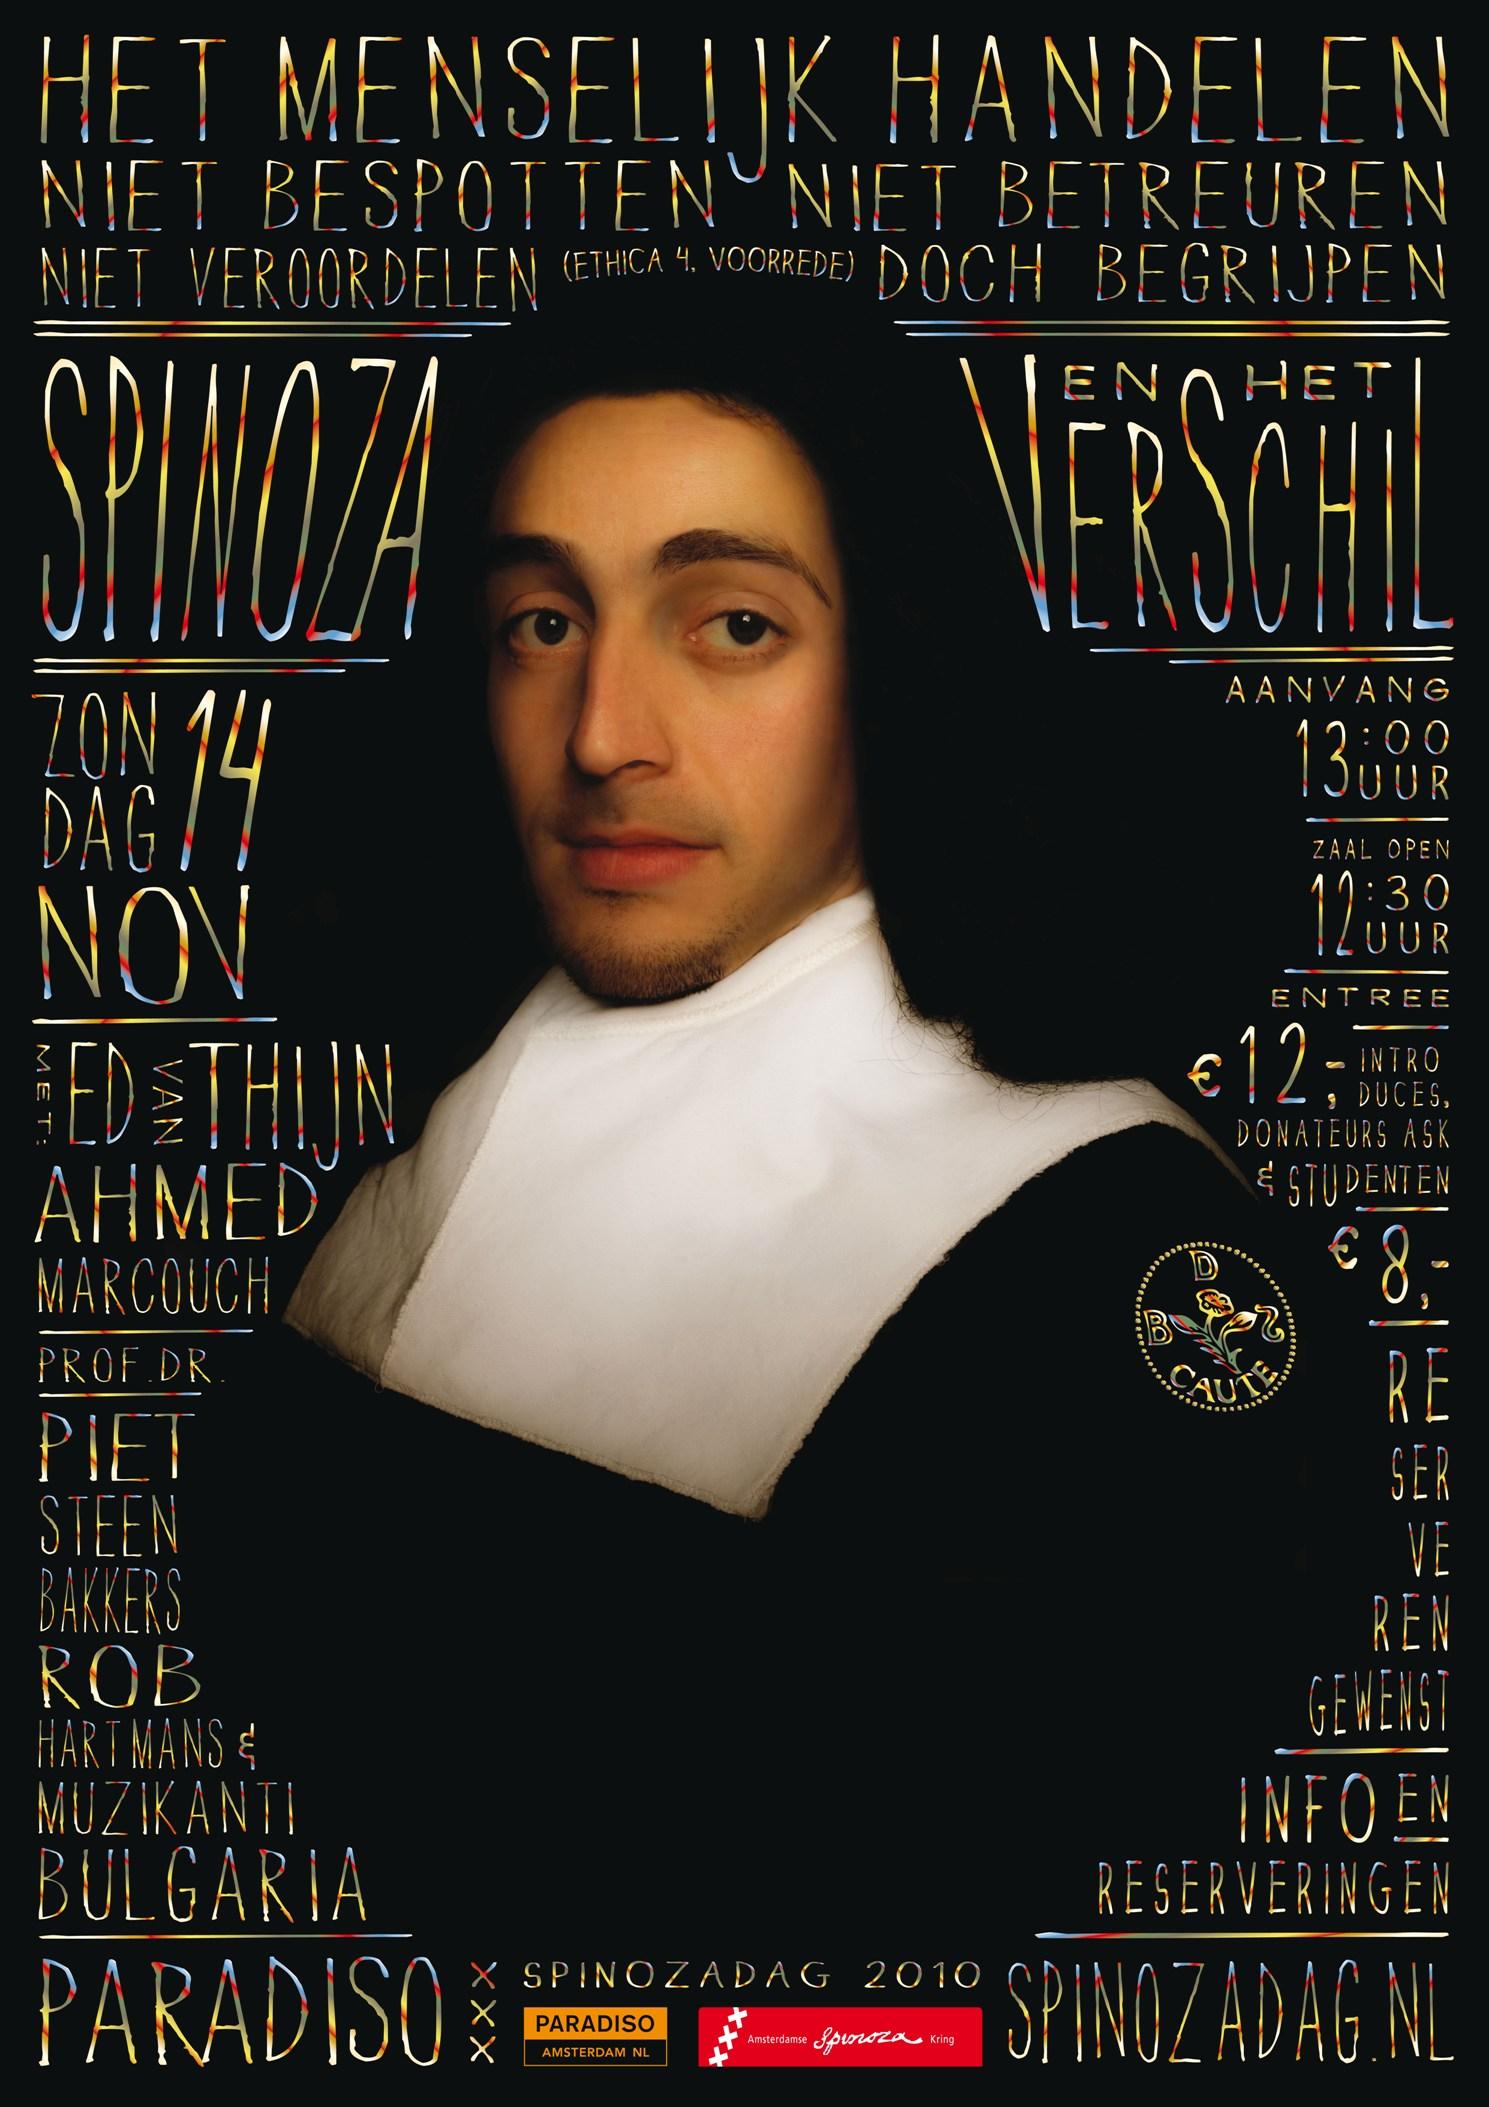 Citaten Spinoza Kring : Spinozadag spinoza en het verschil de informatie